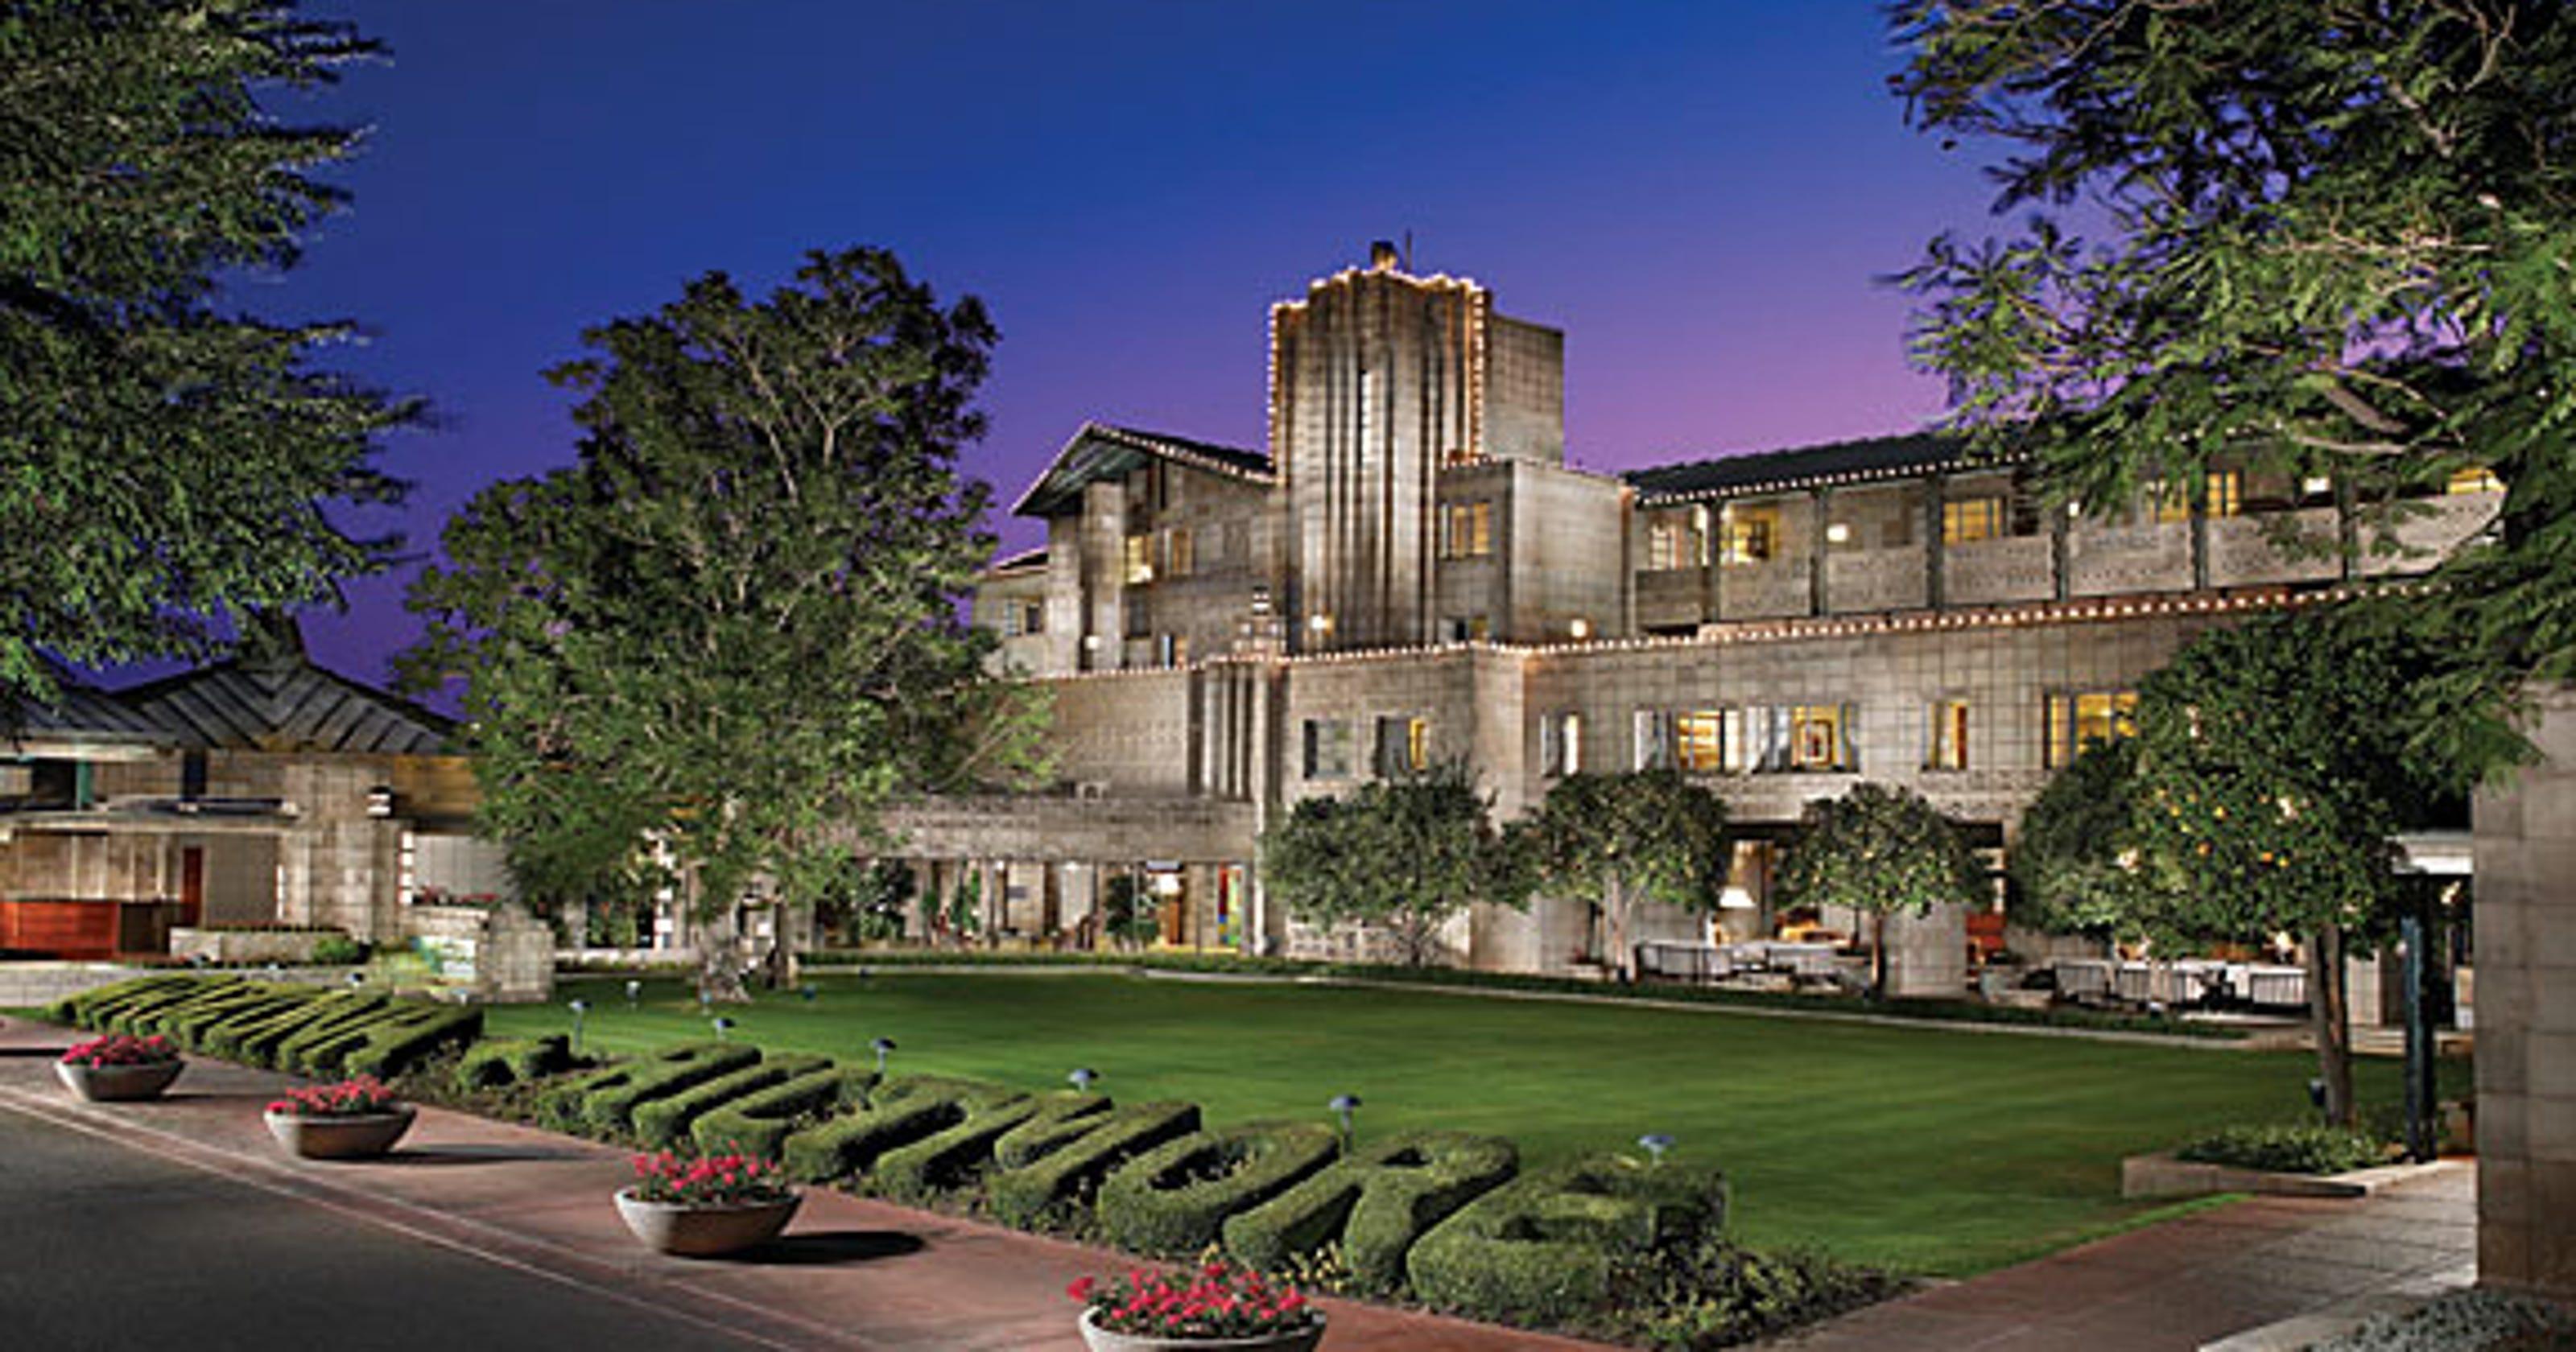 Iconic Arizona Biltmore resort in Phoenix sells for $403 million